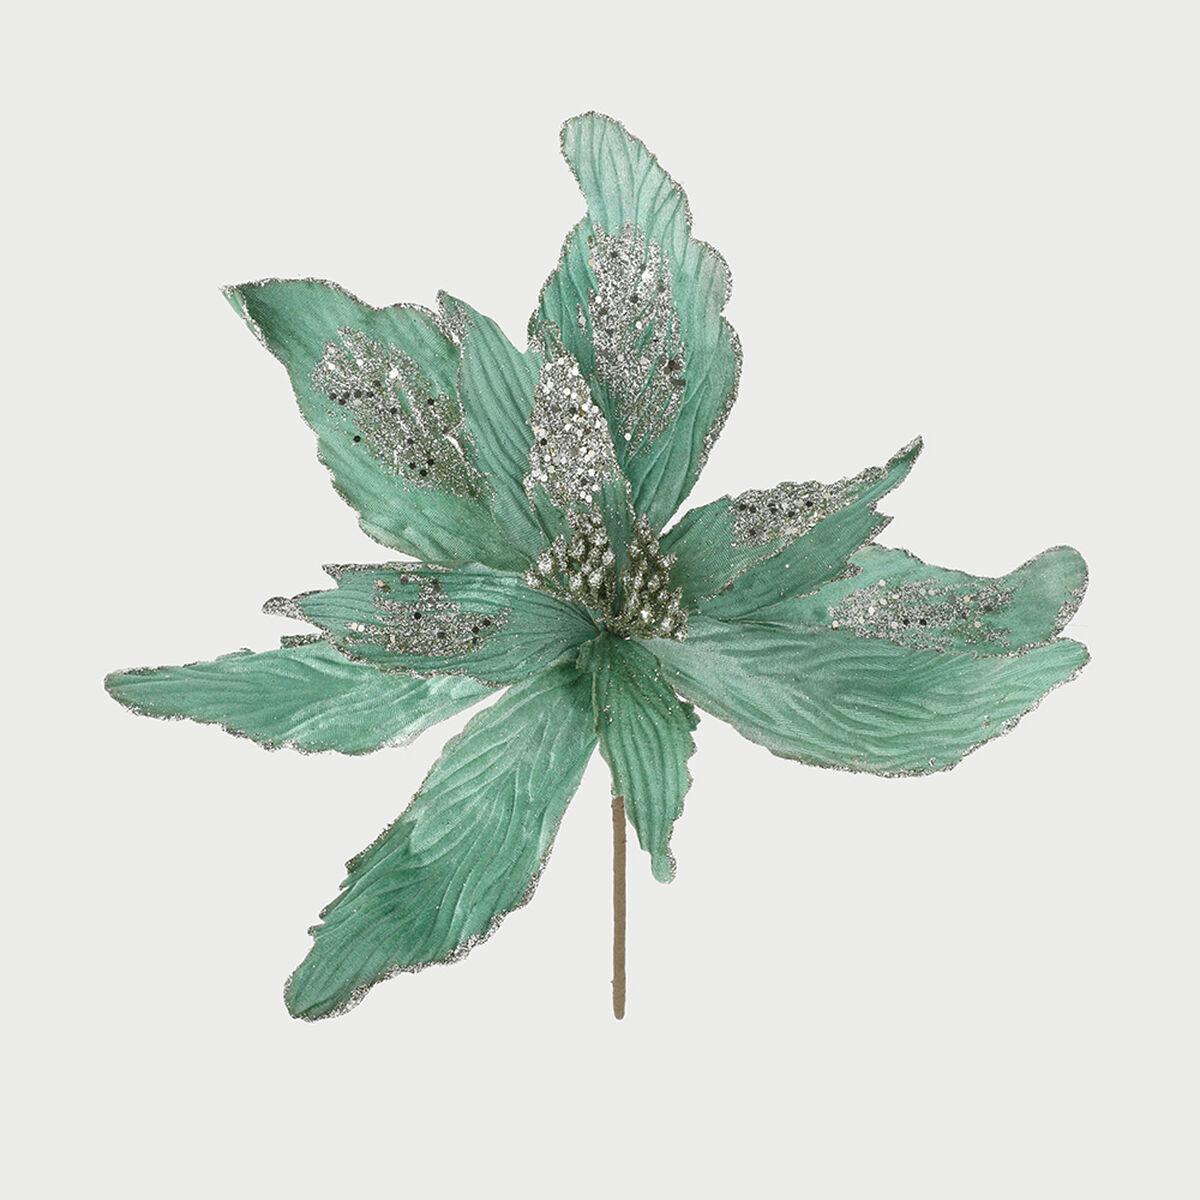 Flor Decorativa 34 Cm